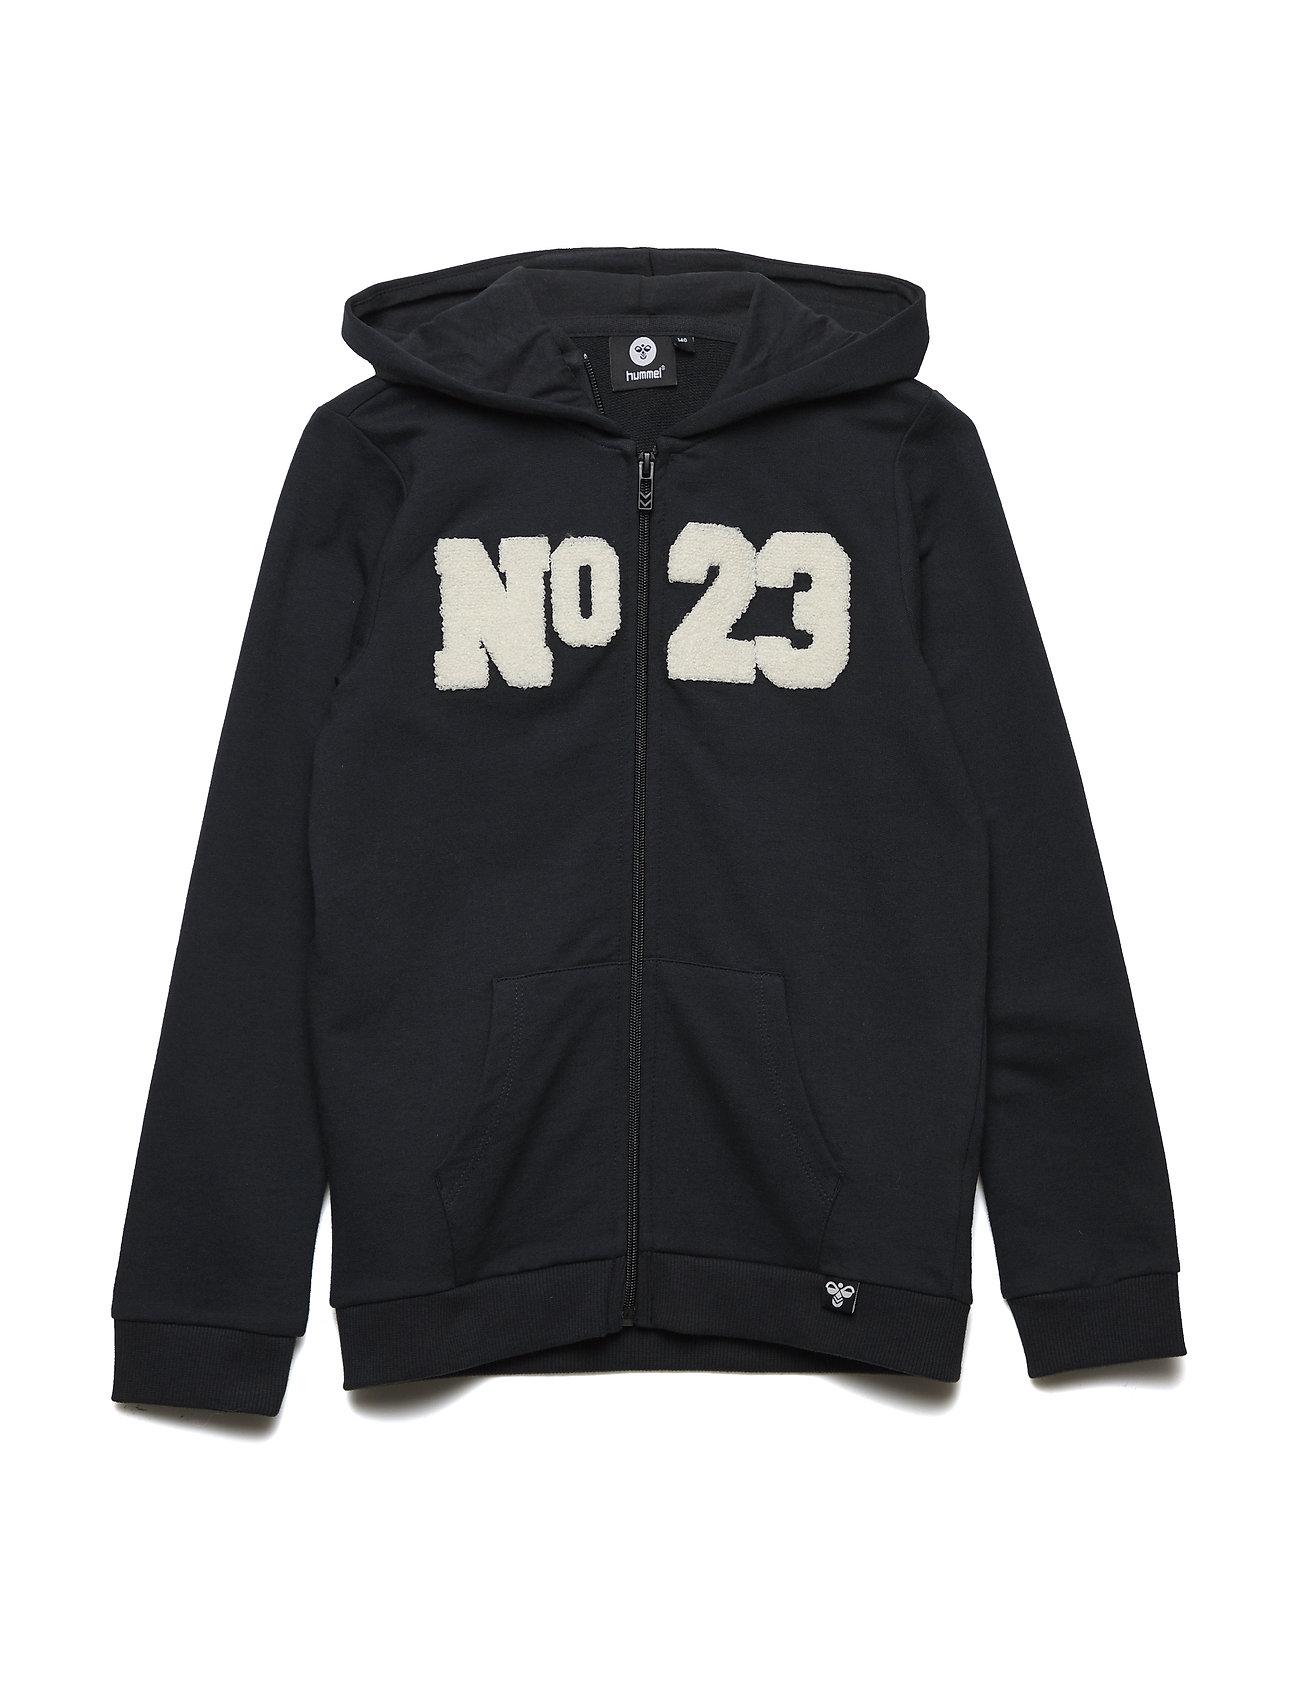 eda0d5f65fb Hummel hoodies – Hmlbilly Zip Hoodie til børn i Sort - Pashion.dk